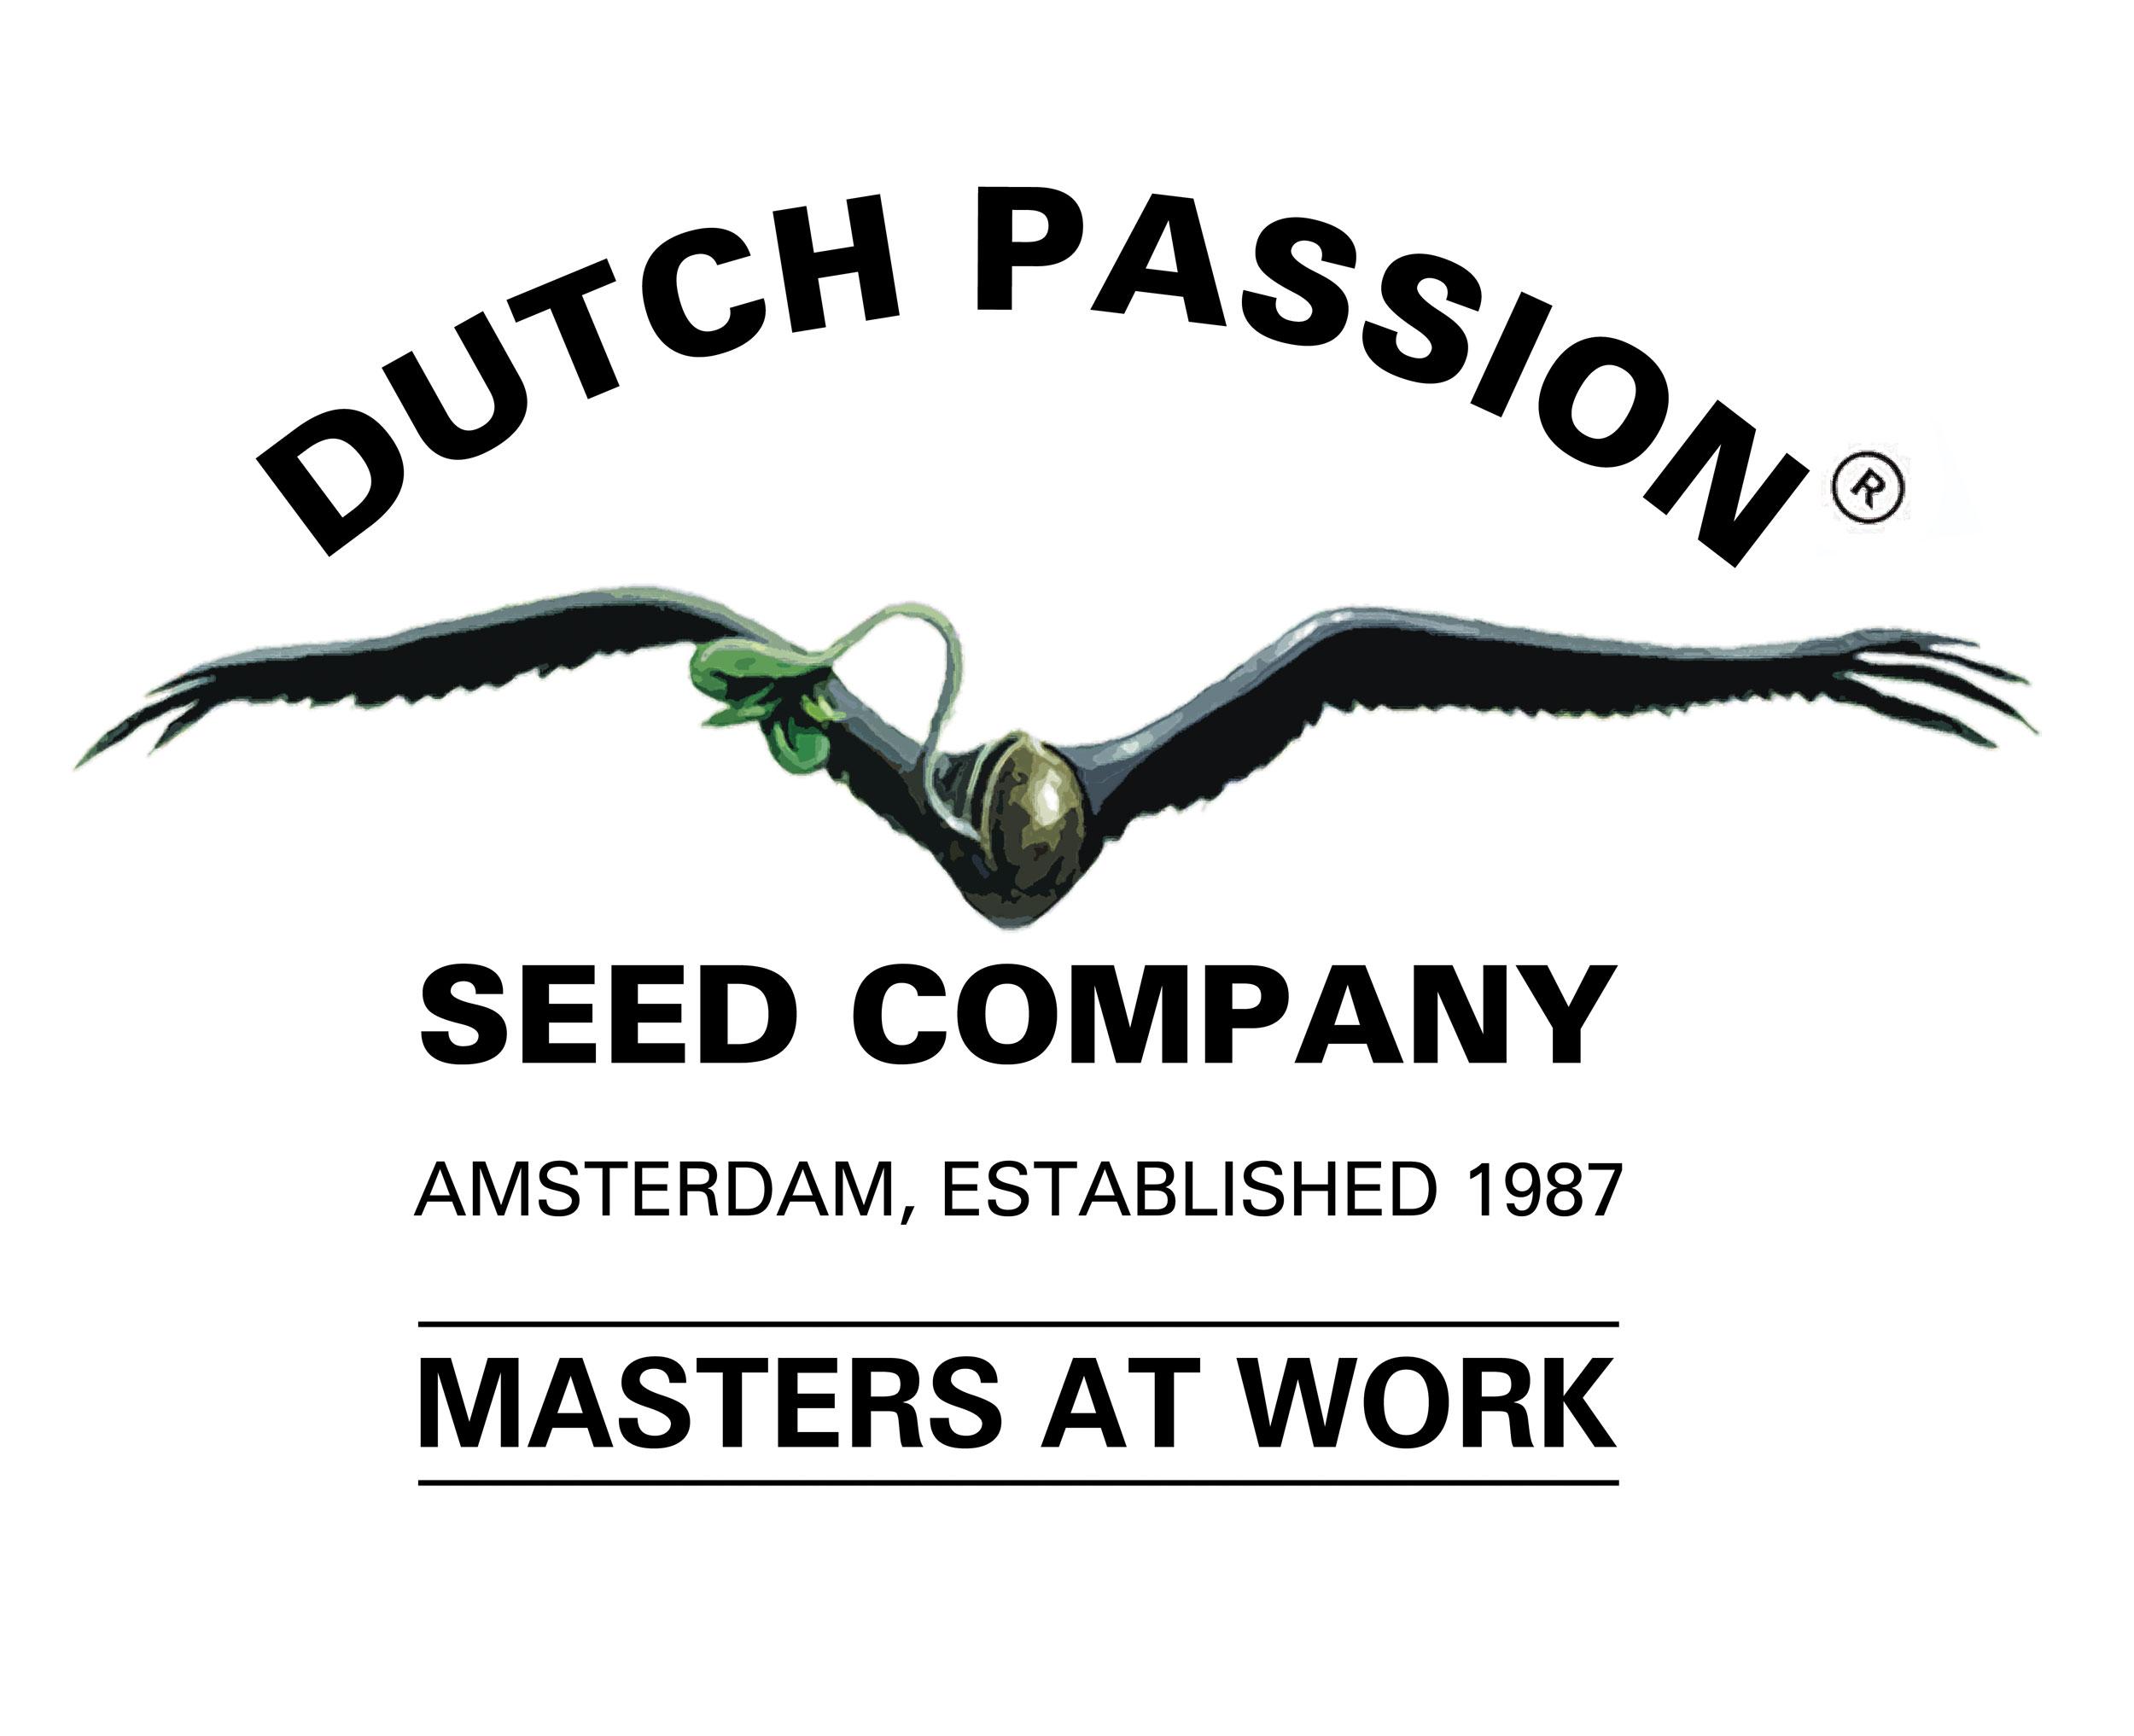 Dutch Passion StarRyder 3ks (Autoflowering)